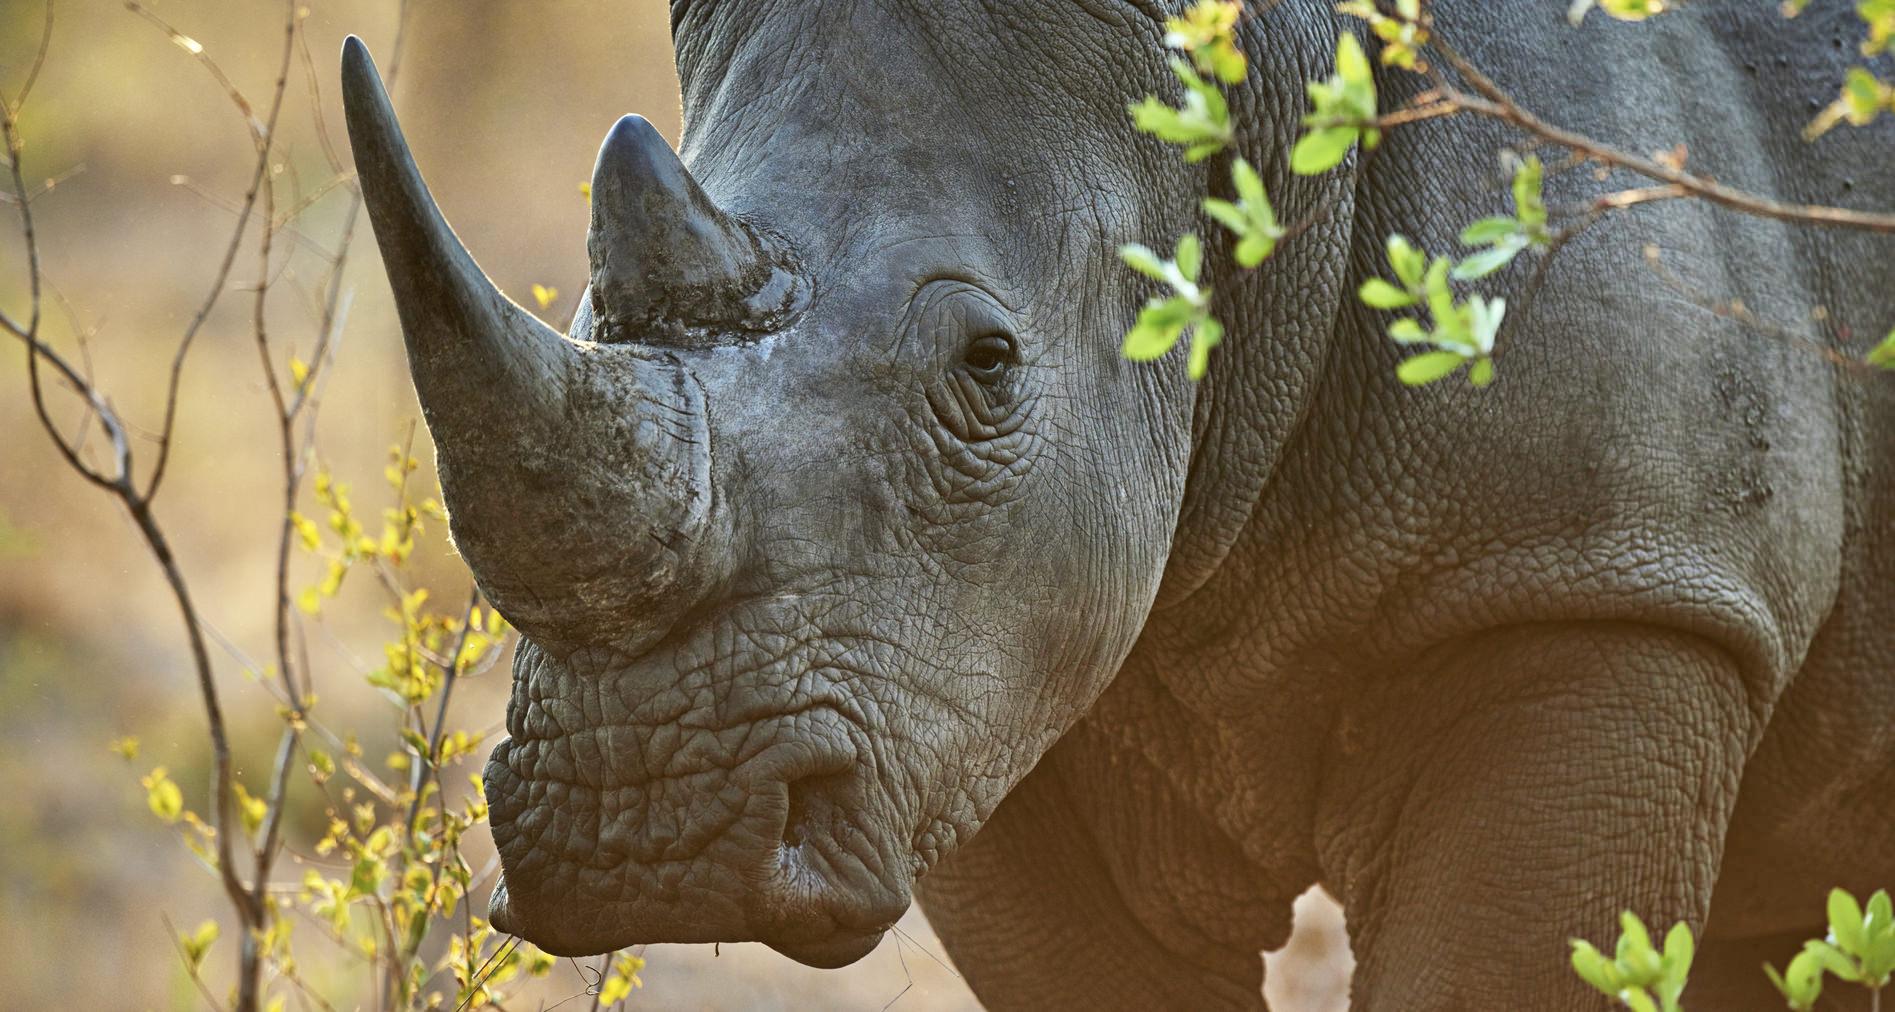 Guida passo-passo per migliorare le tue foto Wildlife